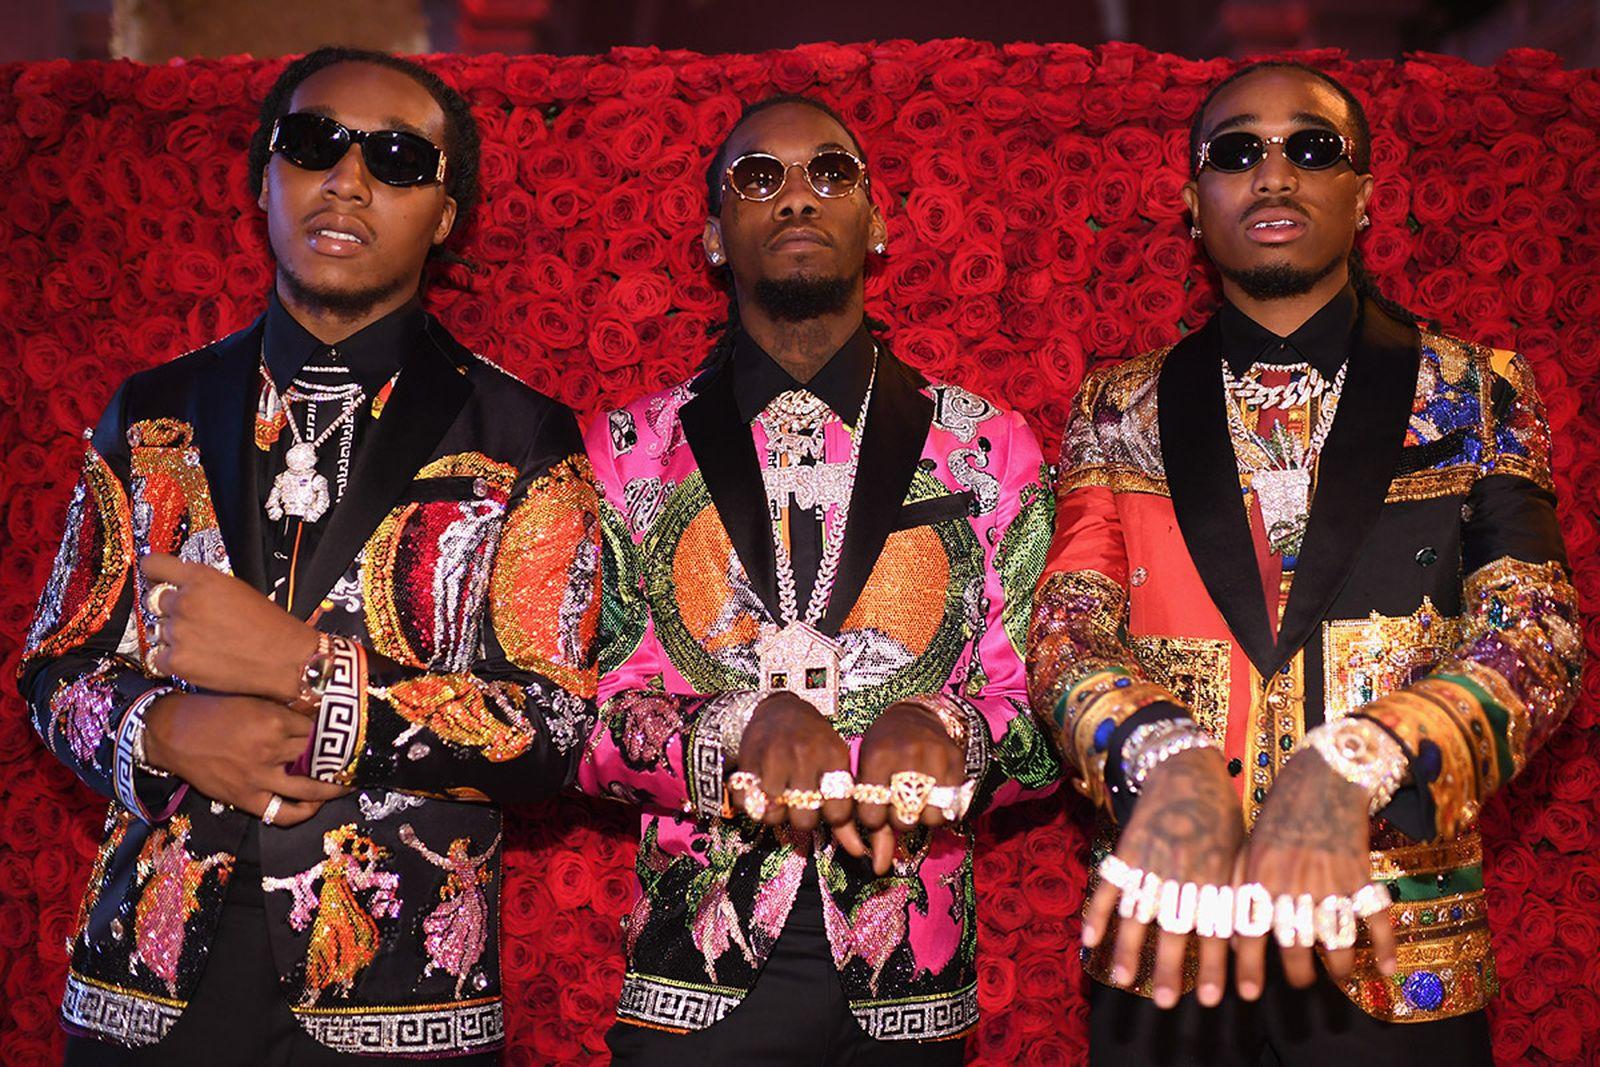 good music seven track album Kids See Ghosts Teyana Taylor kanye west